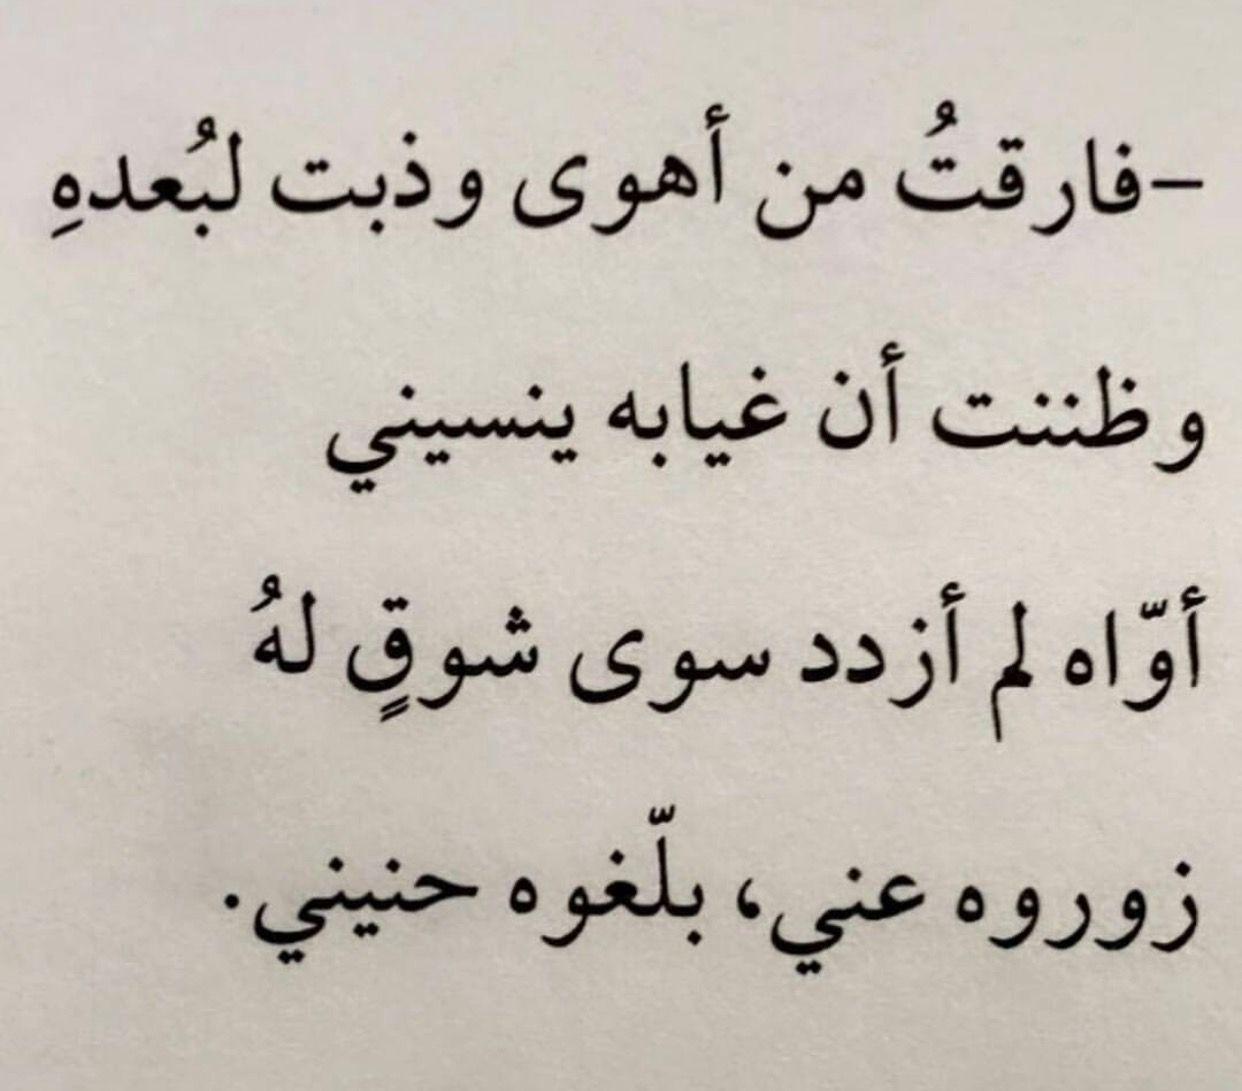 او اه لم ازدد سوى شوق له Words Quotes Love Words Arabic Love Quotes